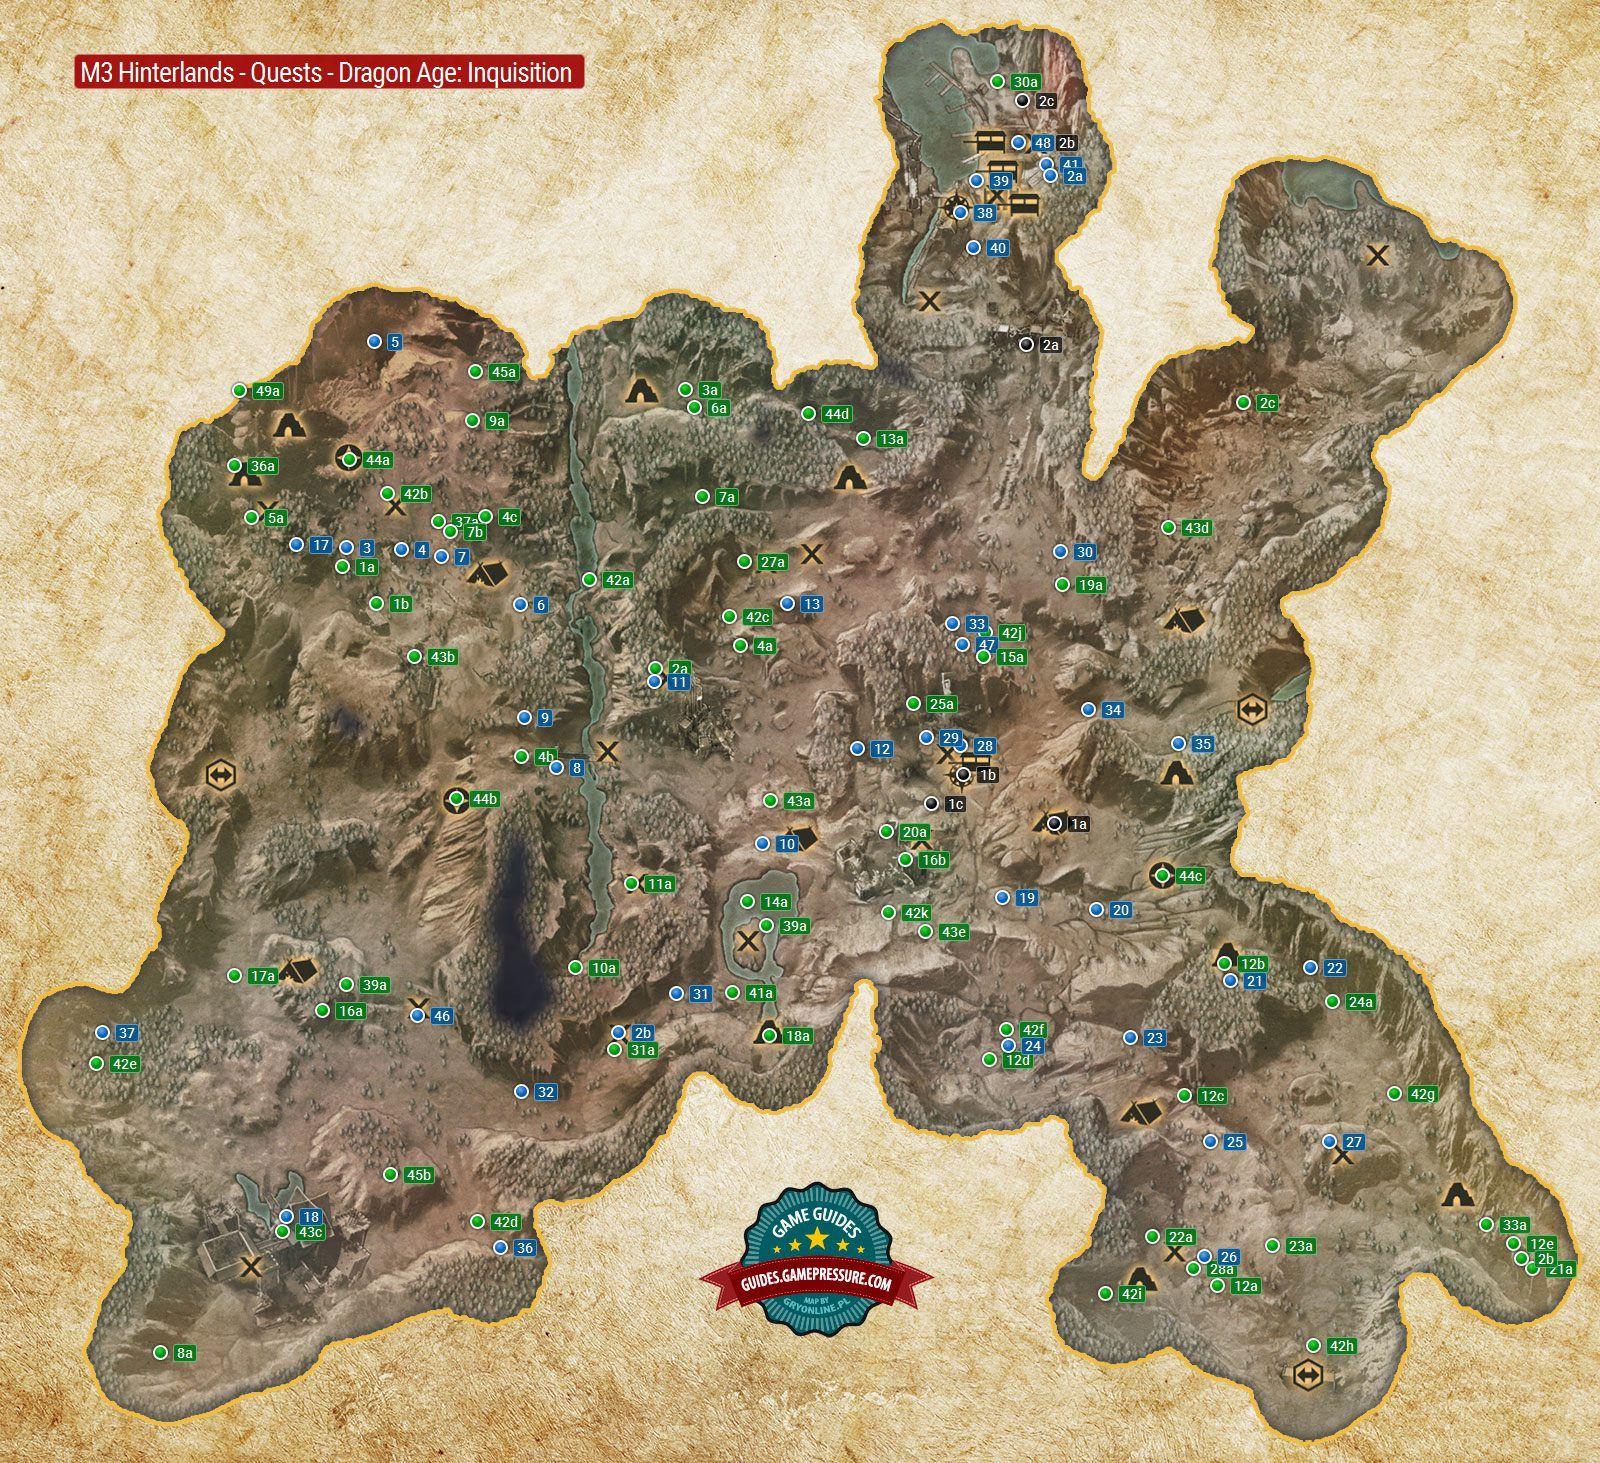 M3 Hinterlands Quests Dragon Age Inquisition Dragon Age Dragon Game Guide